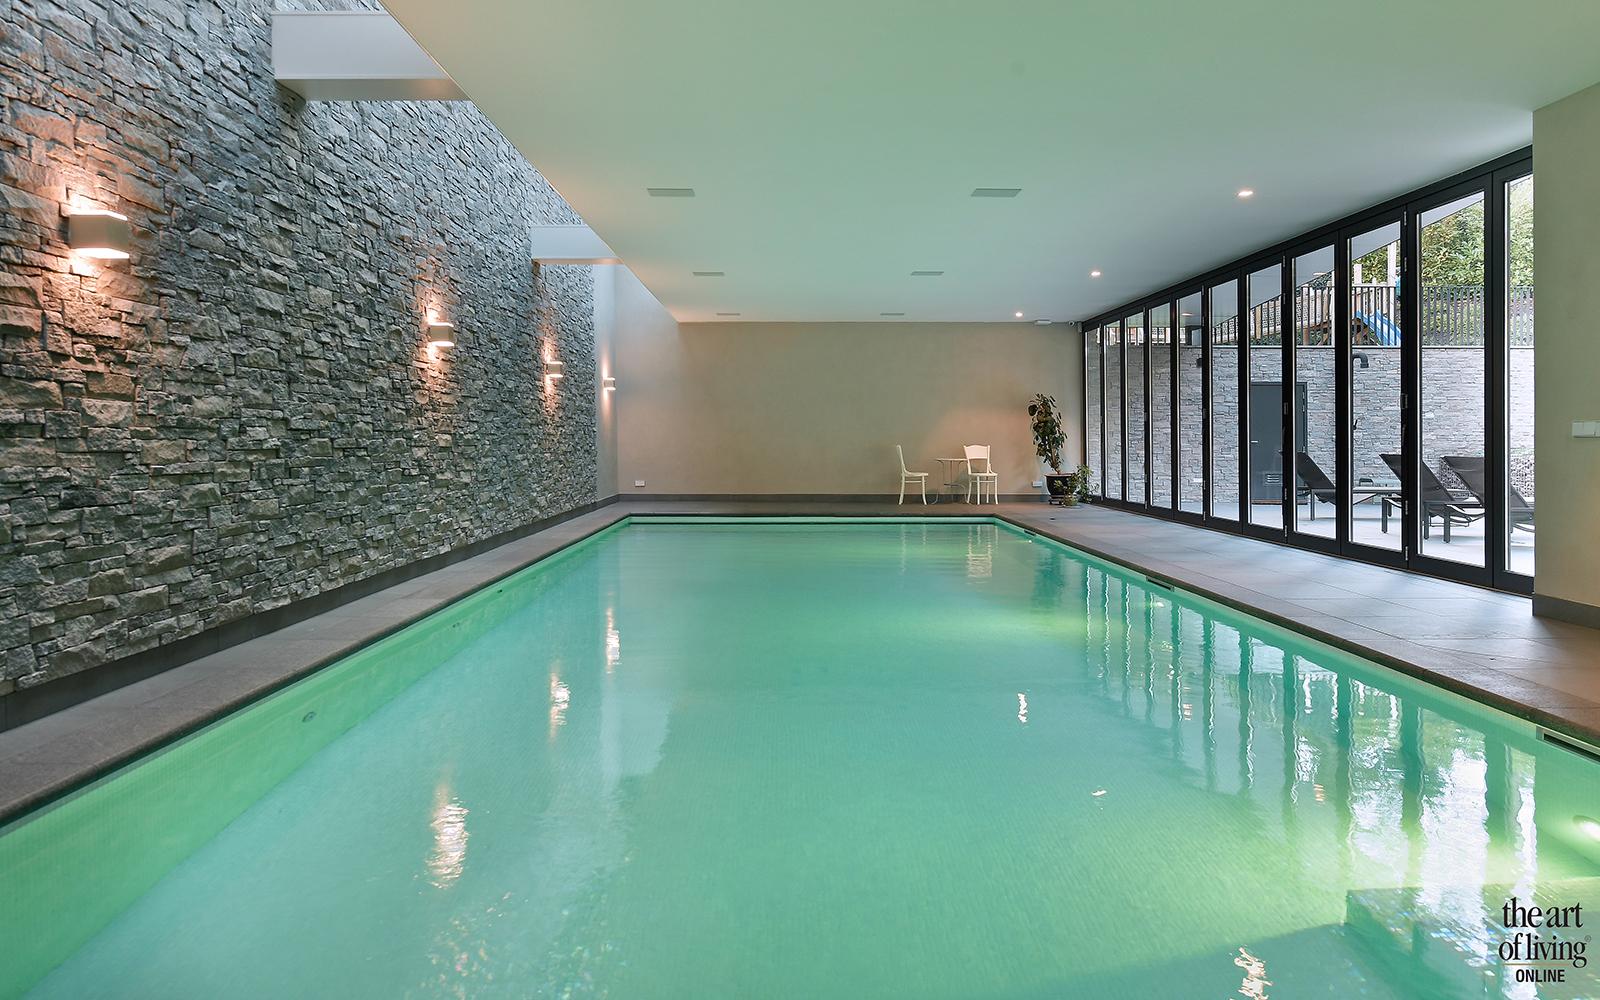 Zwembad voor thuis, Binnenzwembad, Zwembad, Wellness, Home spa, Home Wellness, Sauna, infinity pool